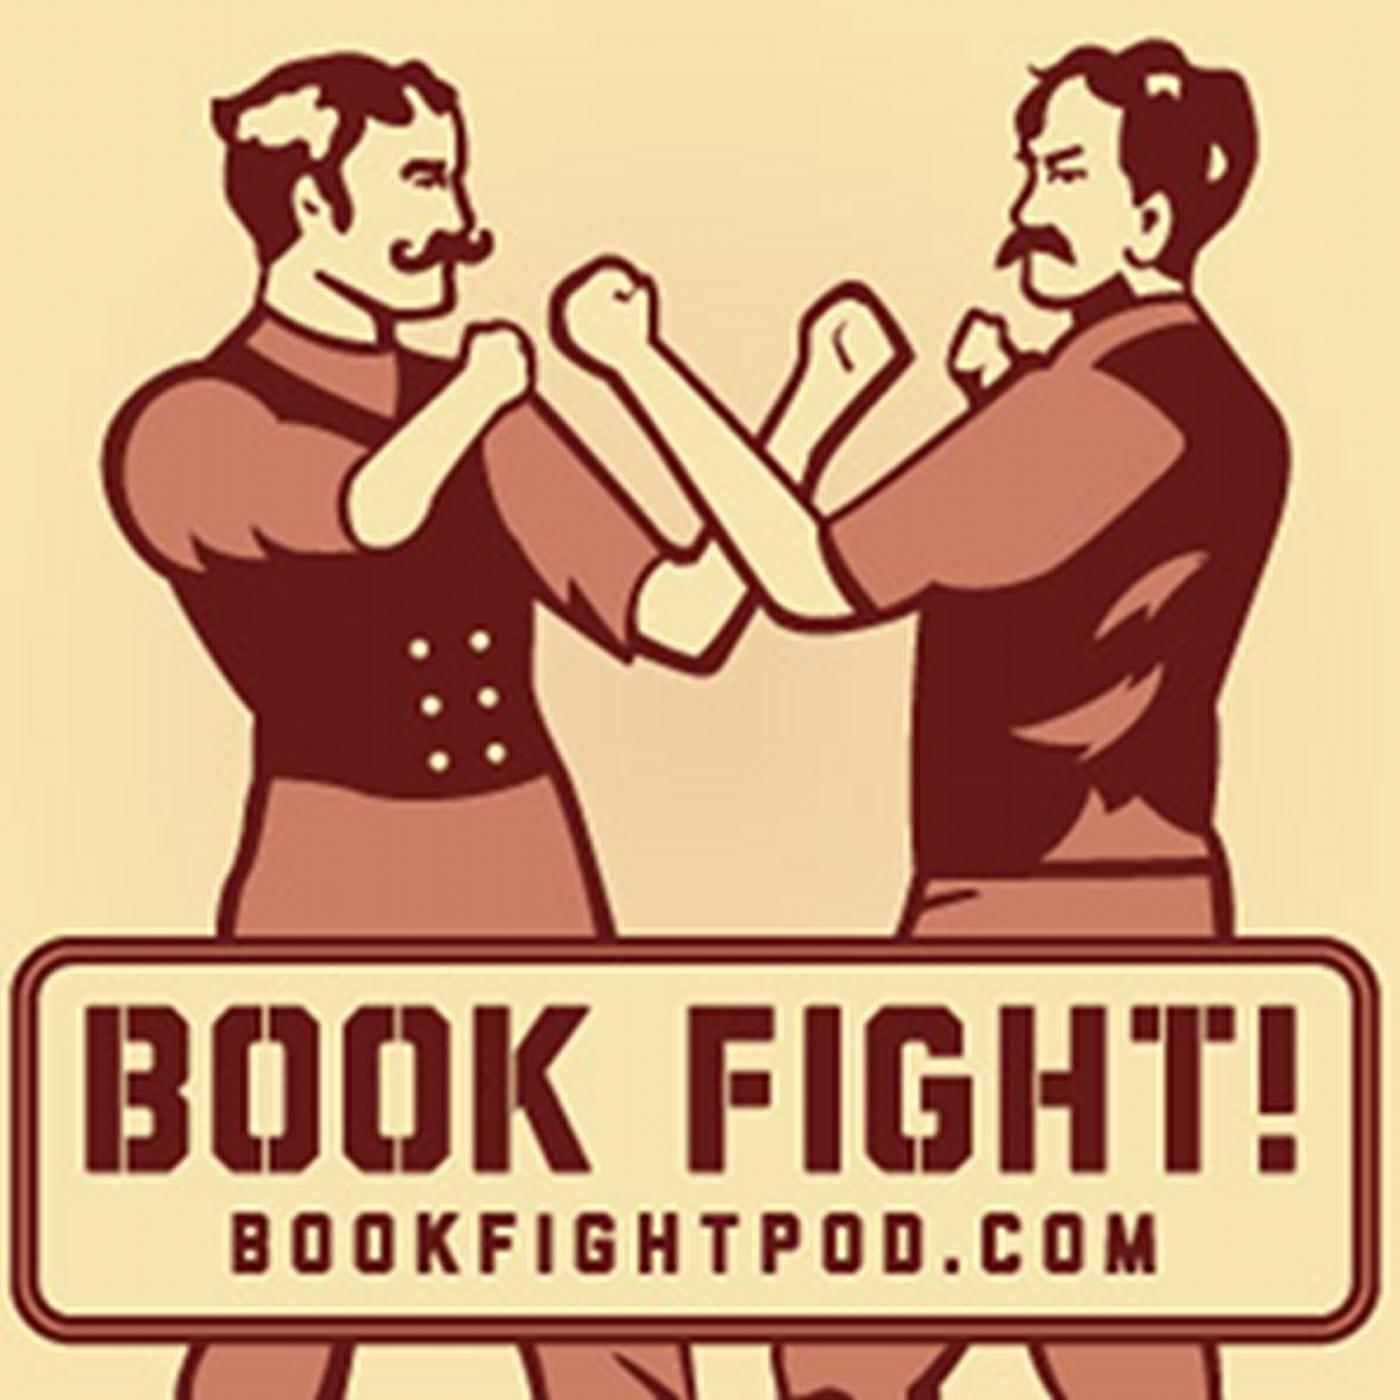 Book Fight